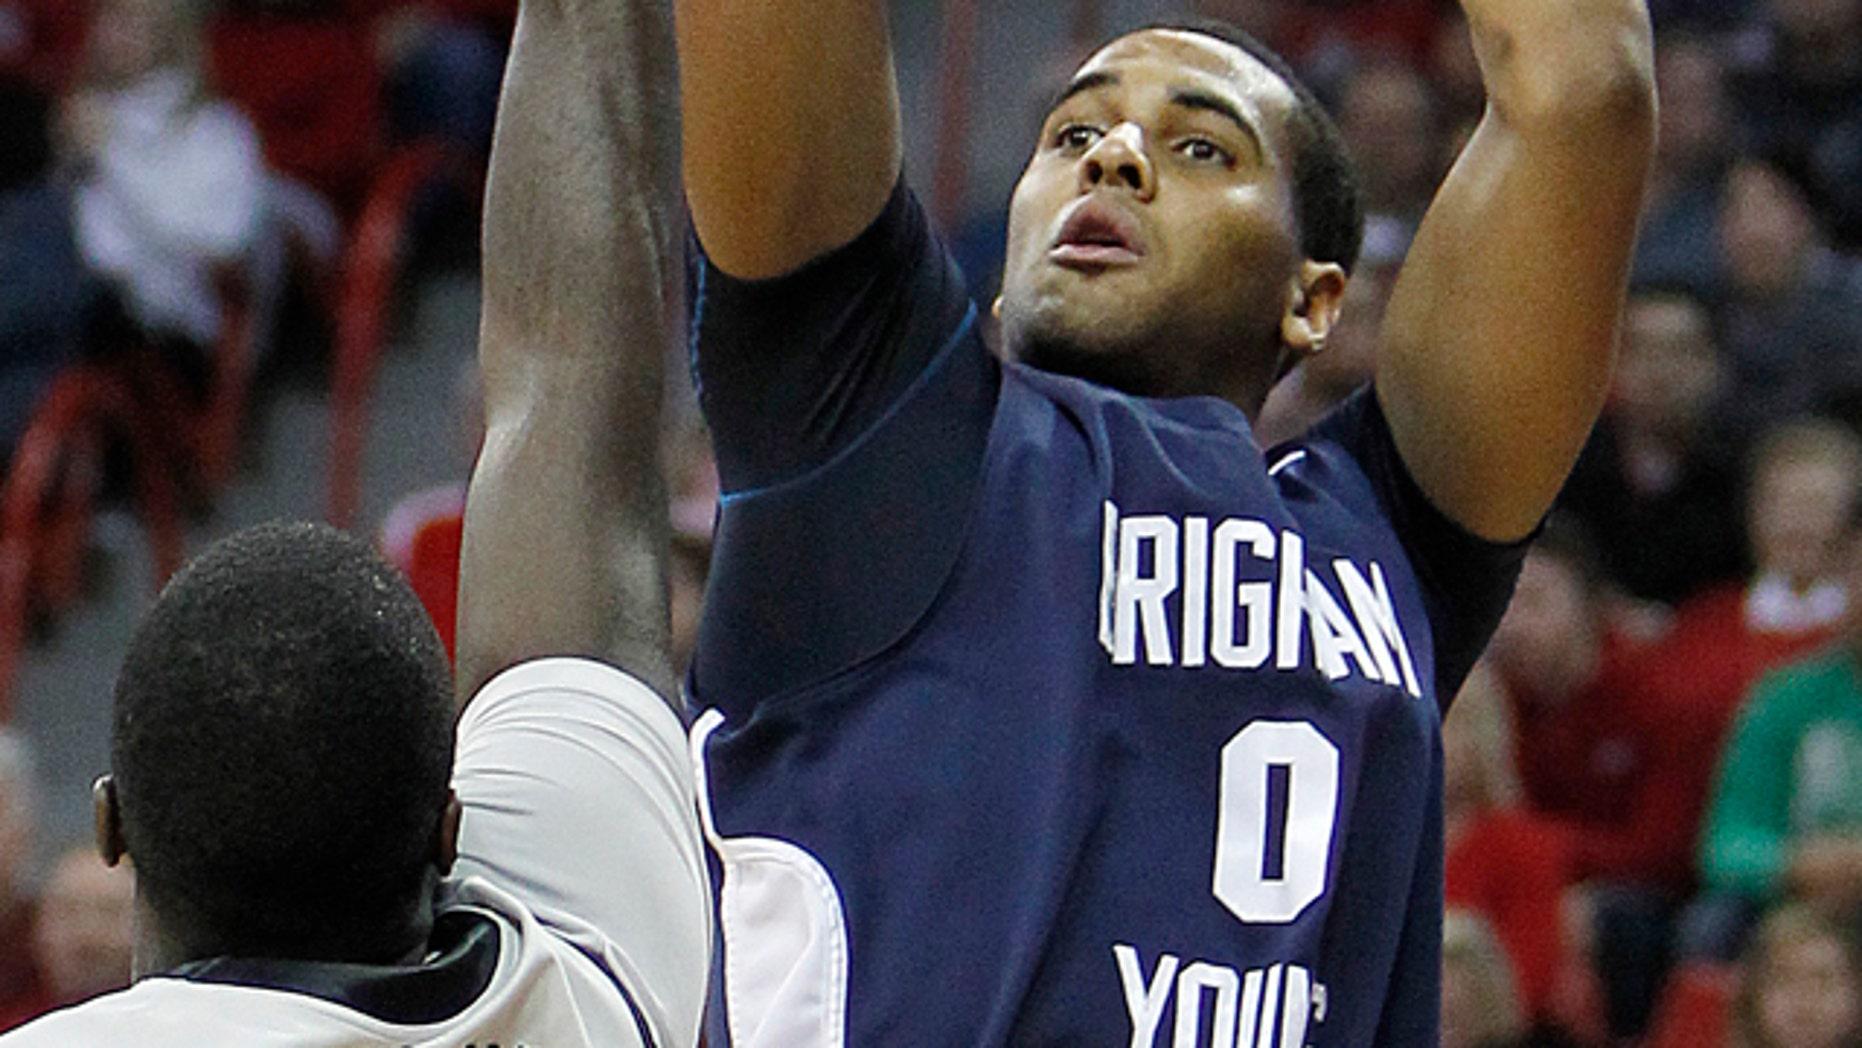 Jan. 5: BYU's Brandon Davies shoots over UNLV's Brice Massamba during an NCAA college basketball game in Las Vegas.